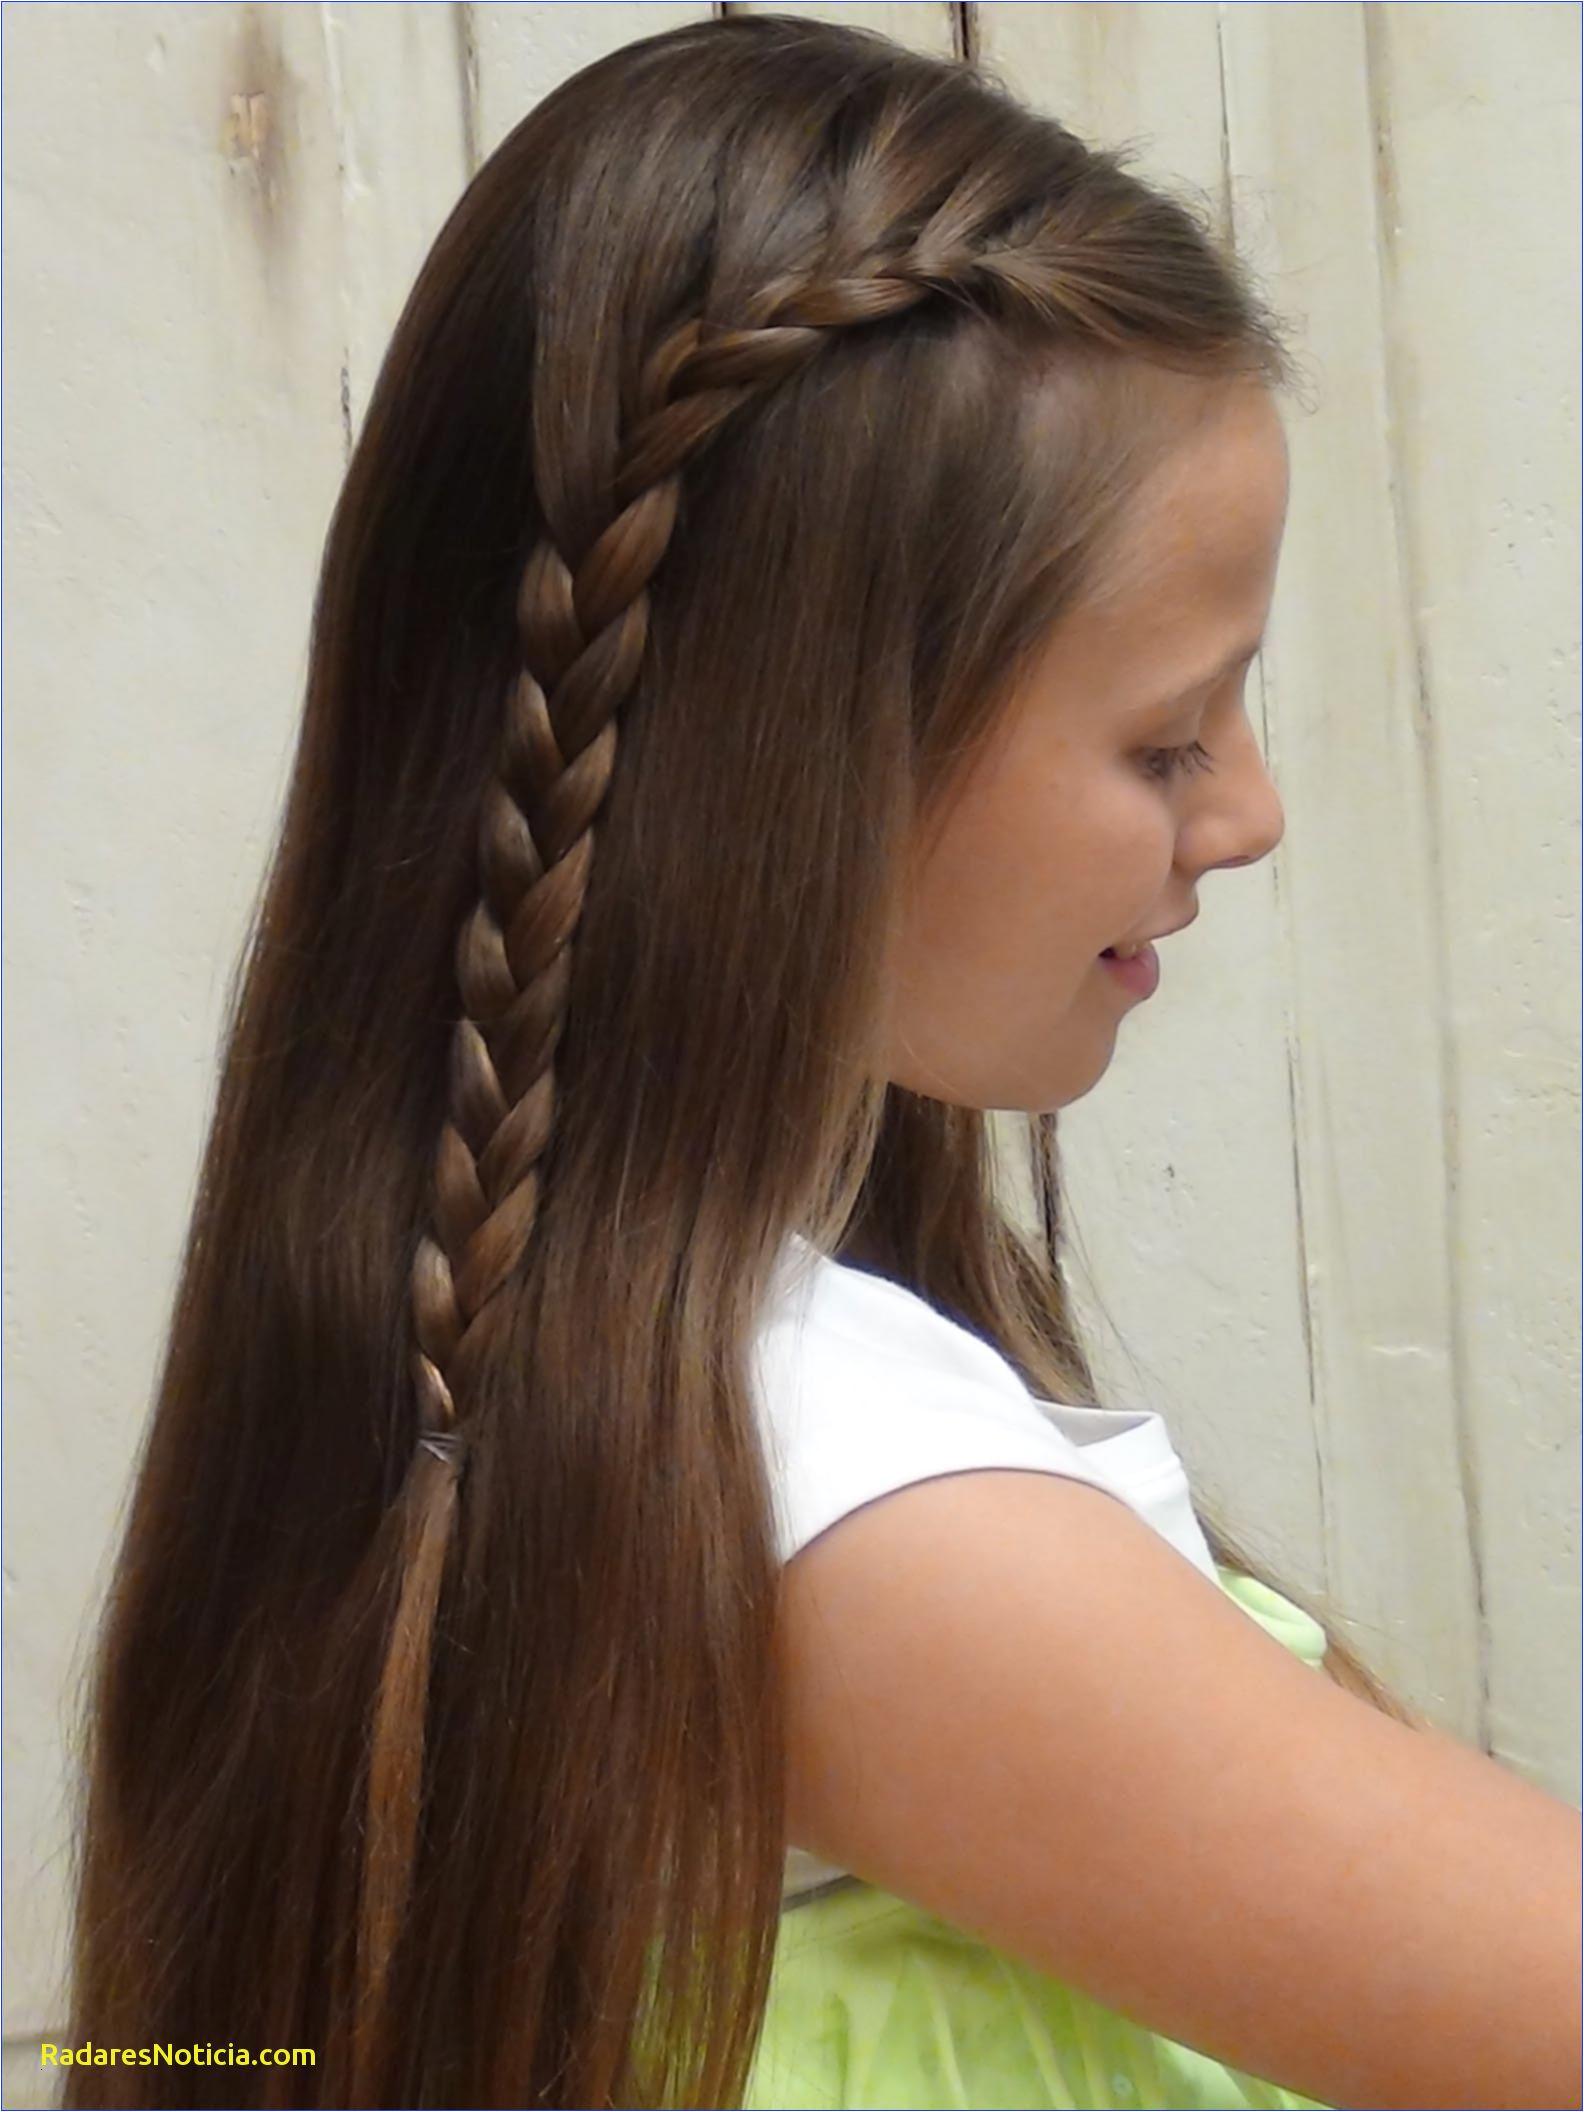 6 List Braided Hairstyles for Short Hair